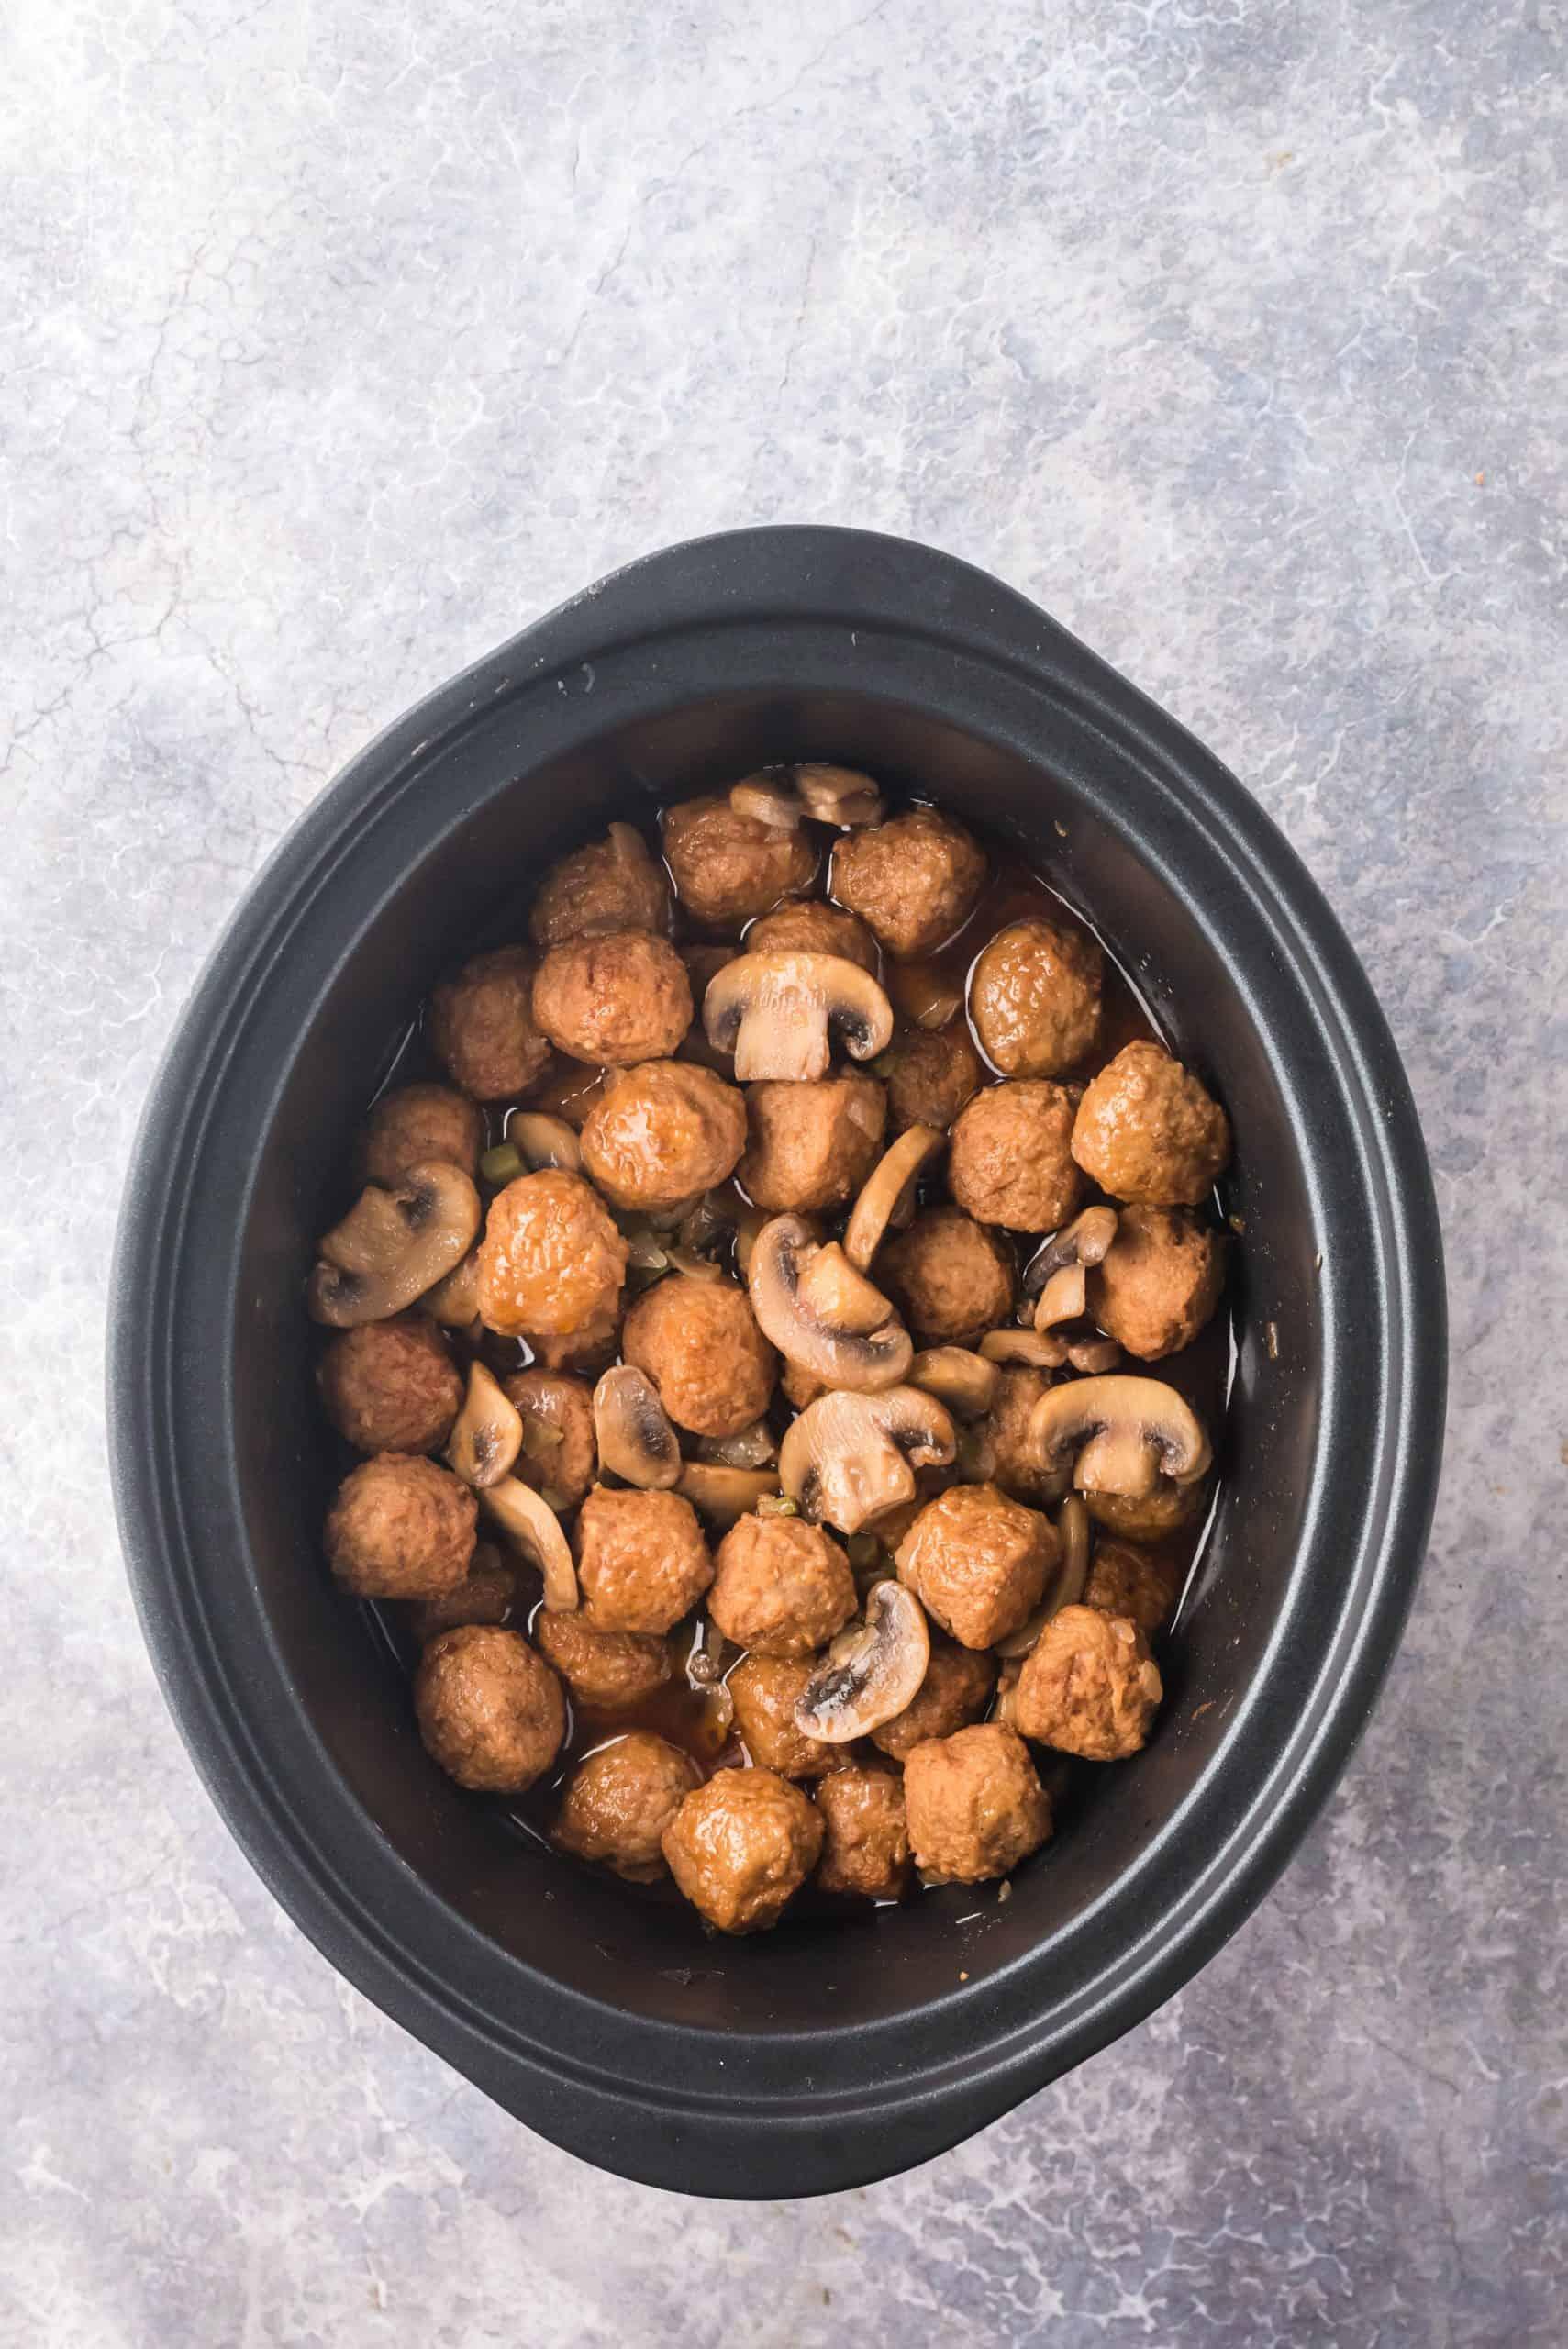 Stirred up mixture in crock pot